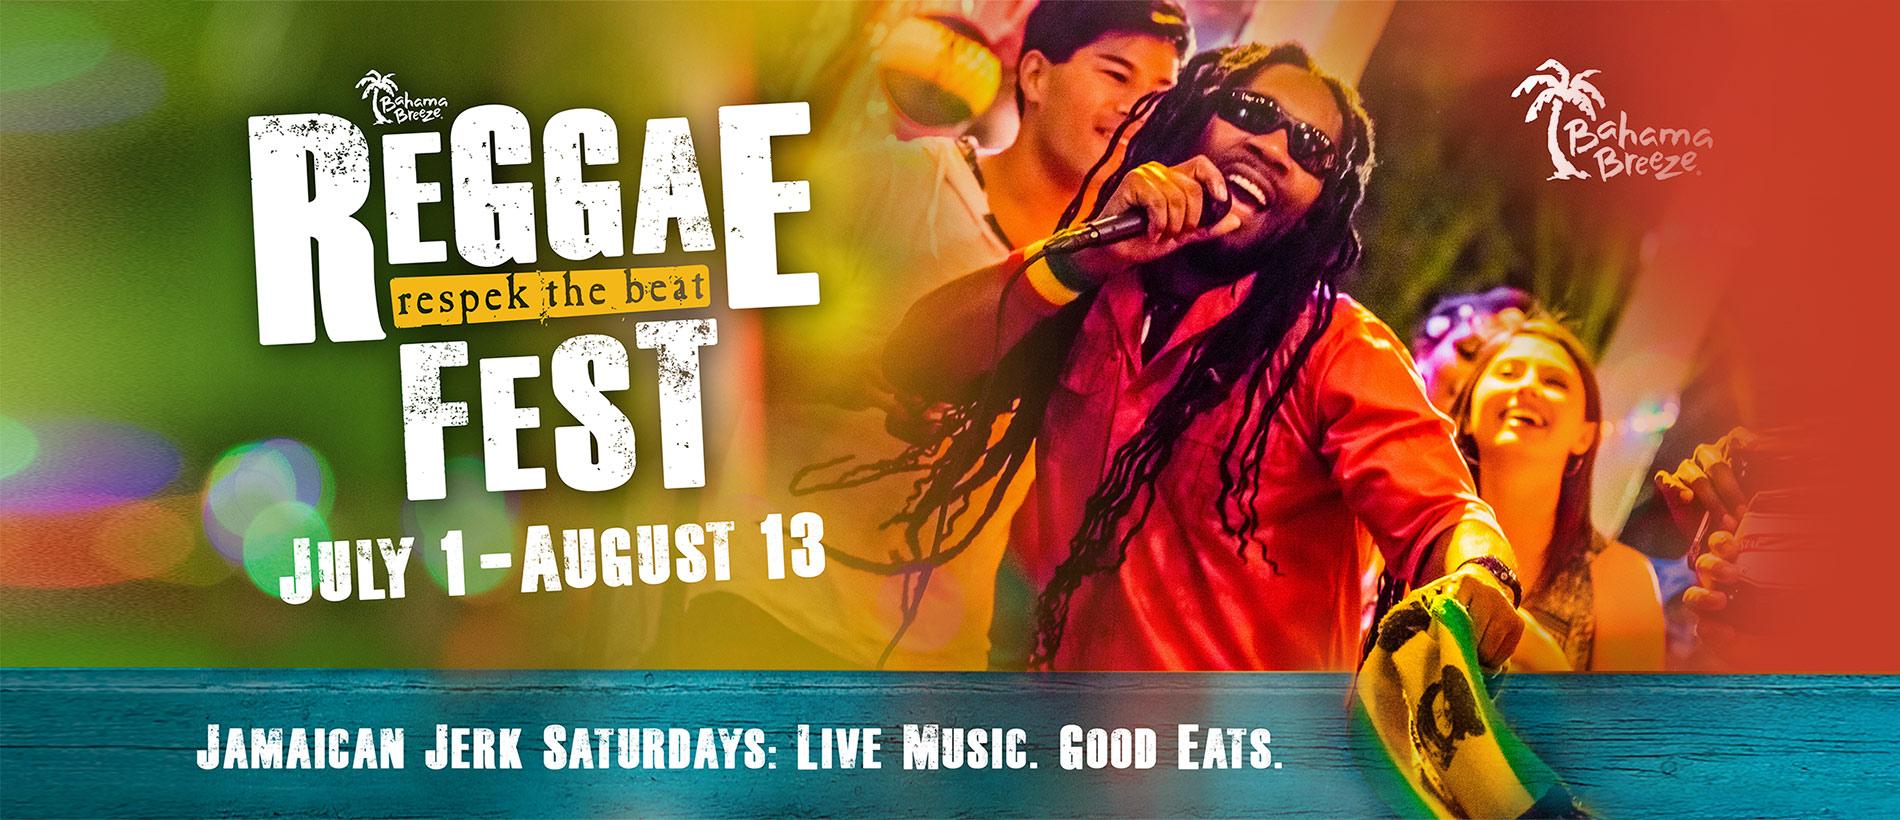 Enjoy live music, good eats & great vibes during Reggae Fest starting July 1!